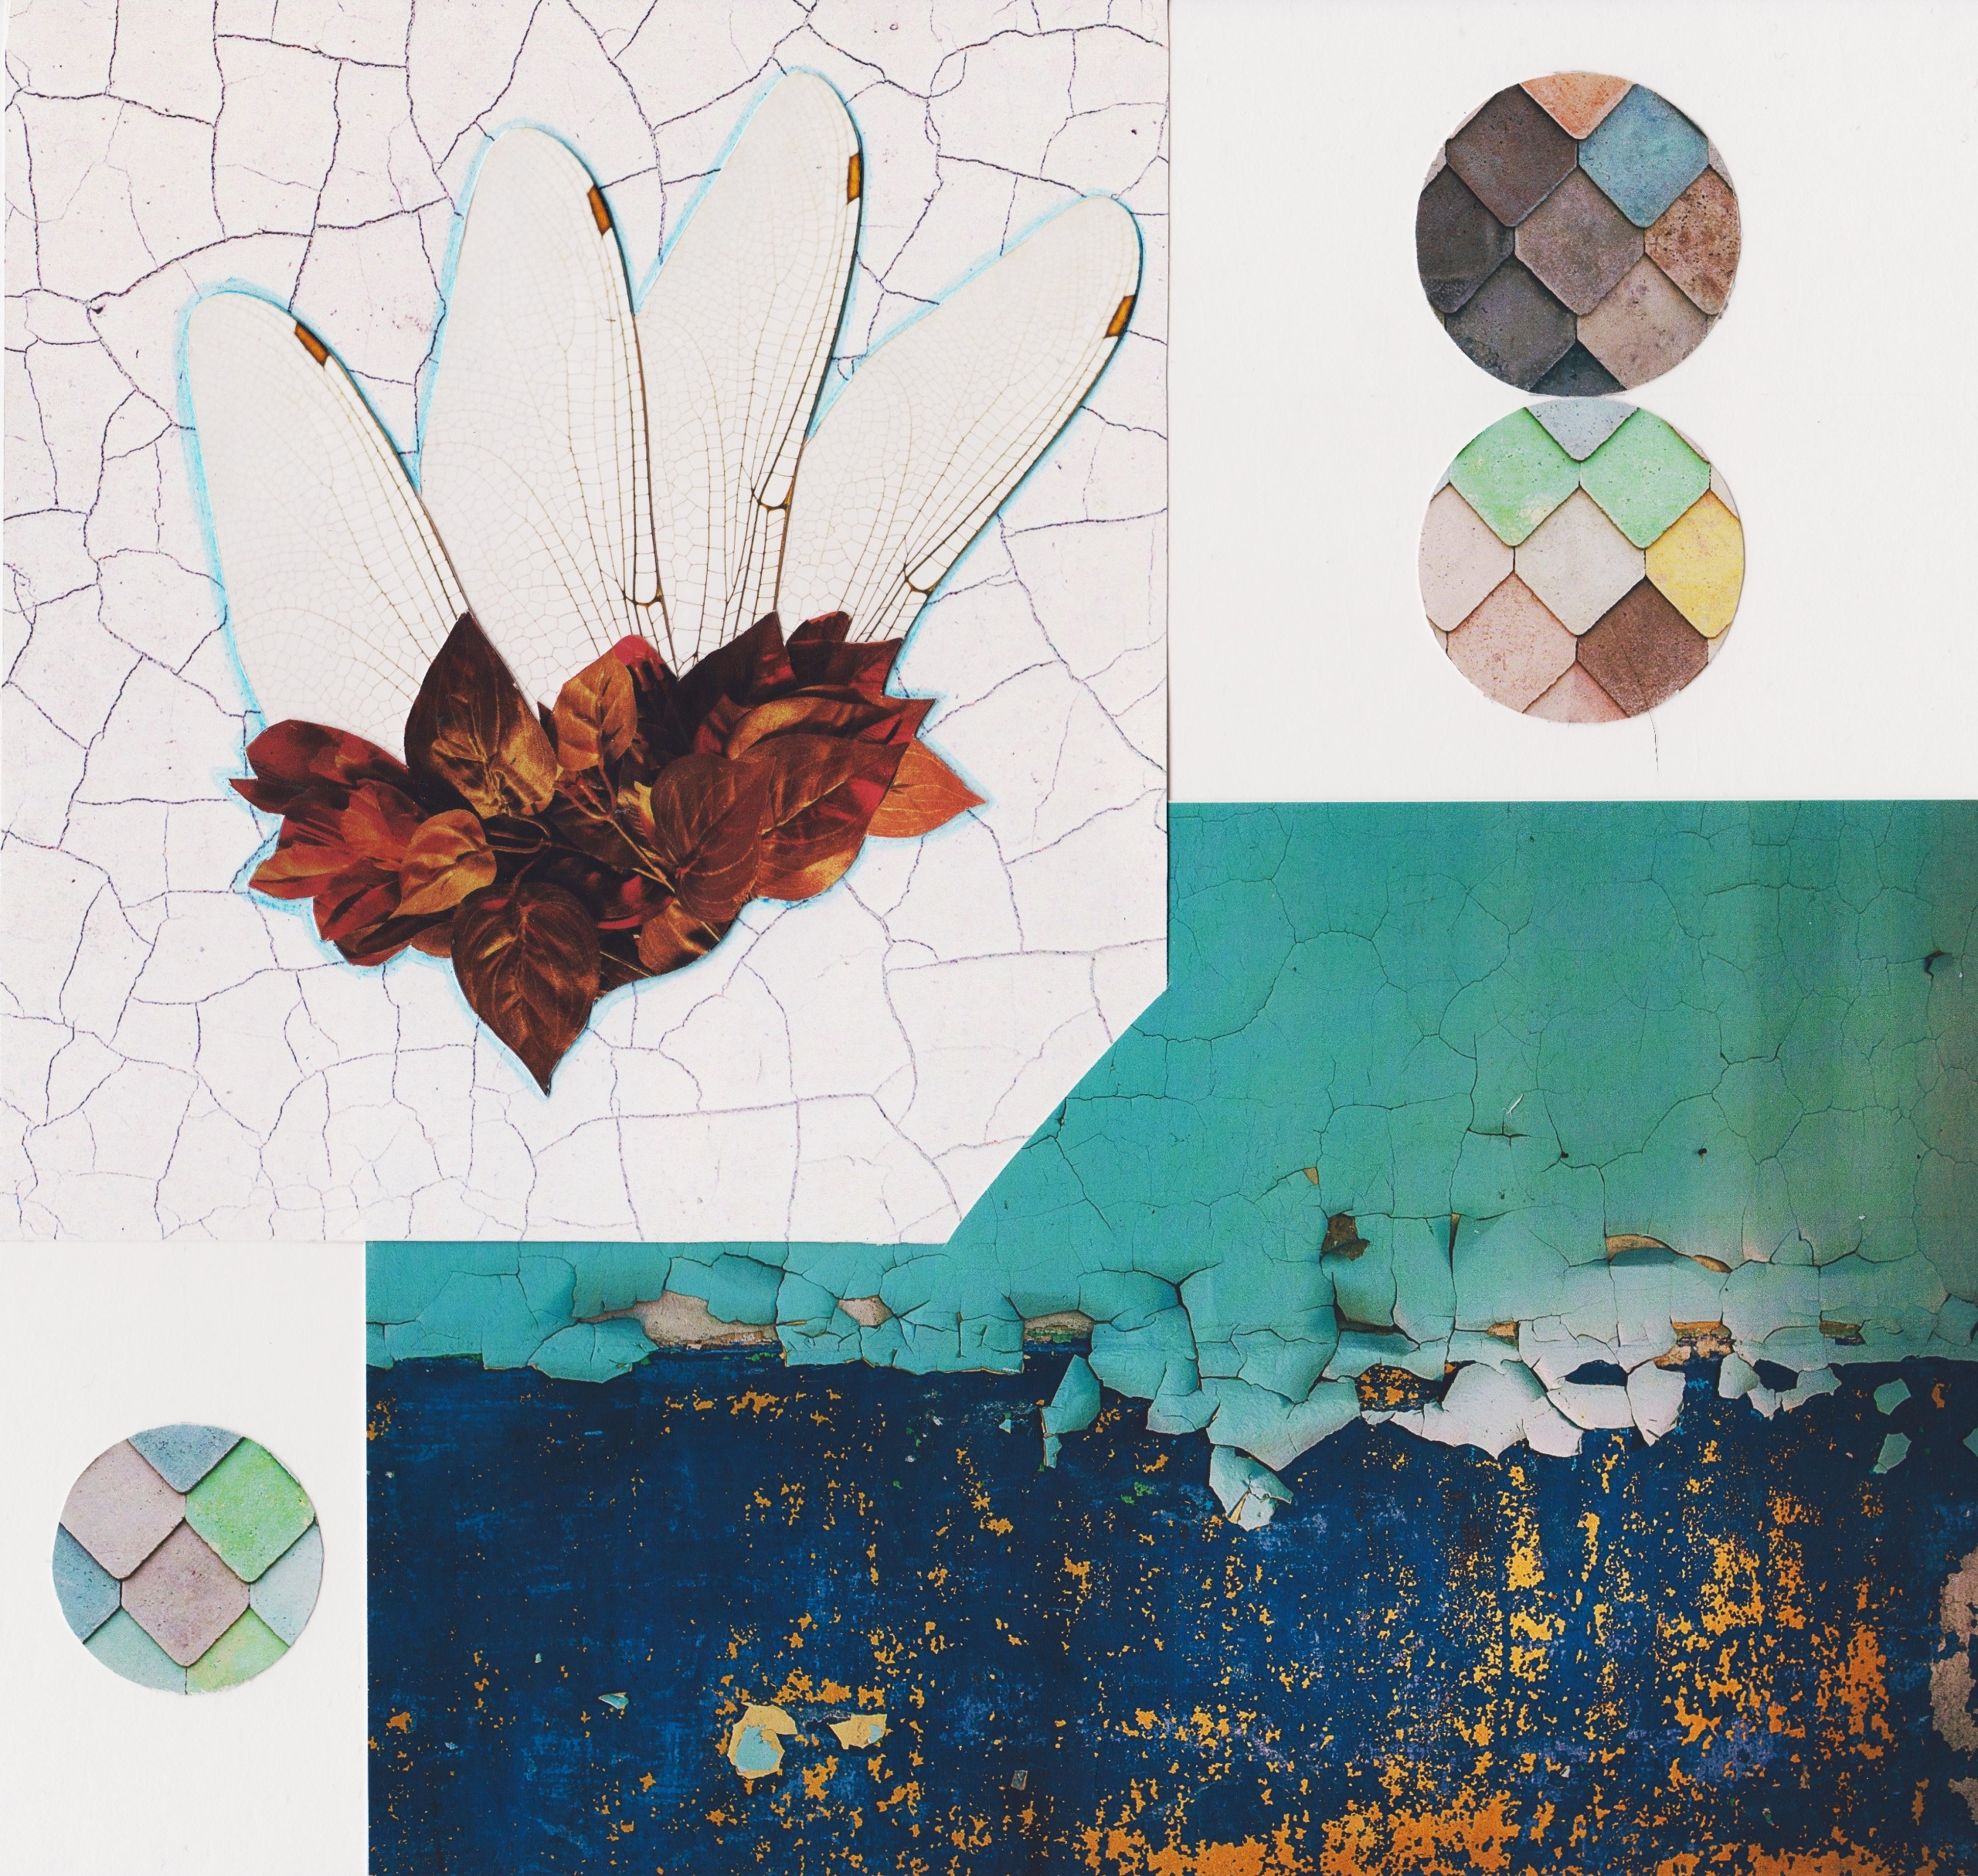 Untitled - Collage, Analogue, Colagem - marianabastoscollage | ello